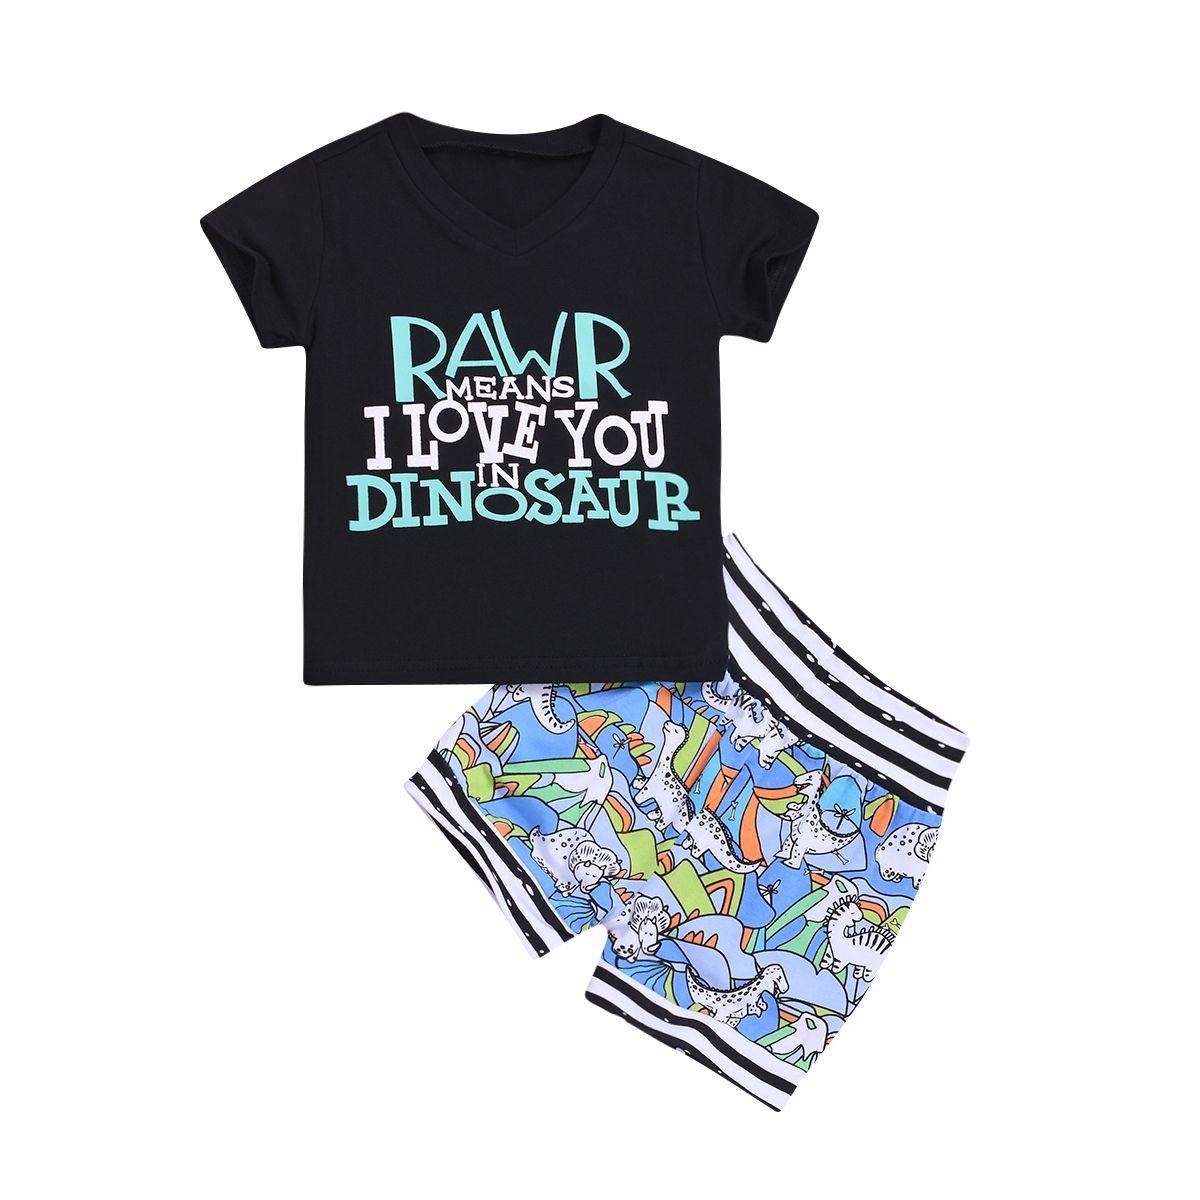 187459a7b USA 2Pcs Toddler Kids Baby Boy Tops T-shirt Dinosaur Pants 2Pcs Outfits  Clothes Boys' Clothing ...